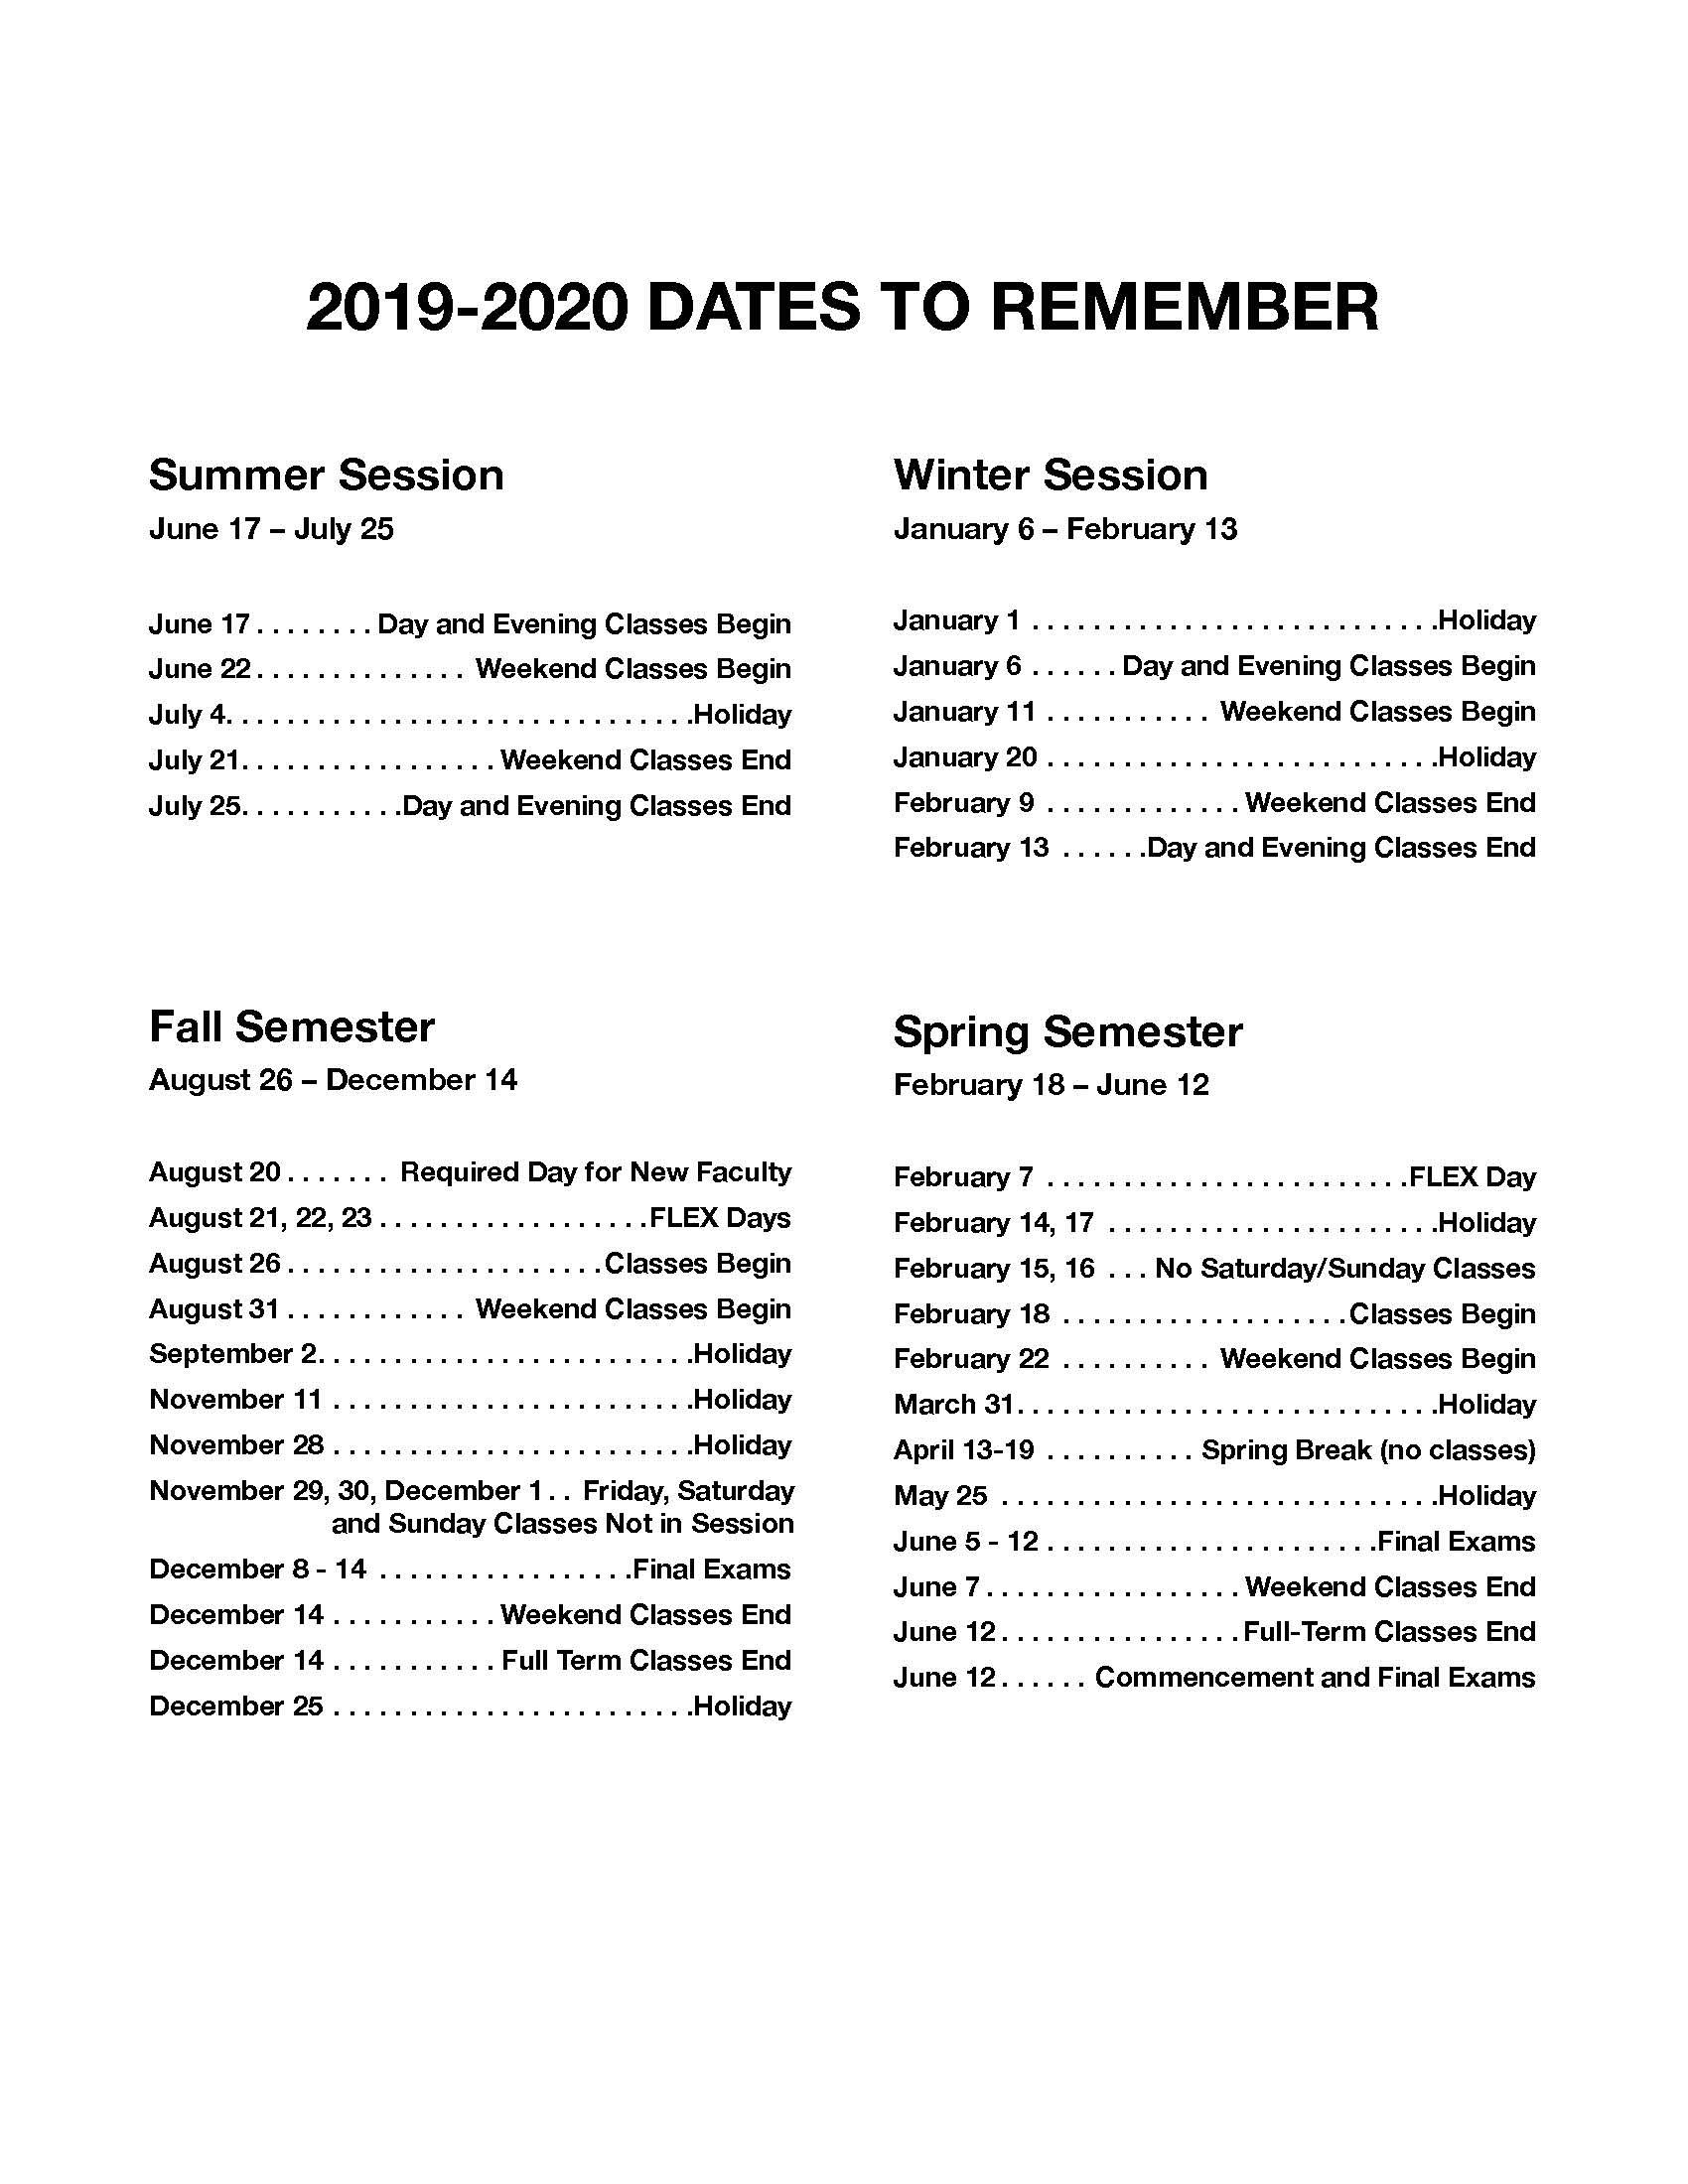 Jfk And Norco College Calendar 2019 2020 – John F. Kennedy With Regard To Corona Unified School District Calendar